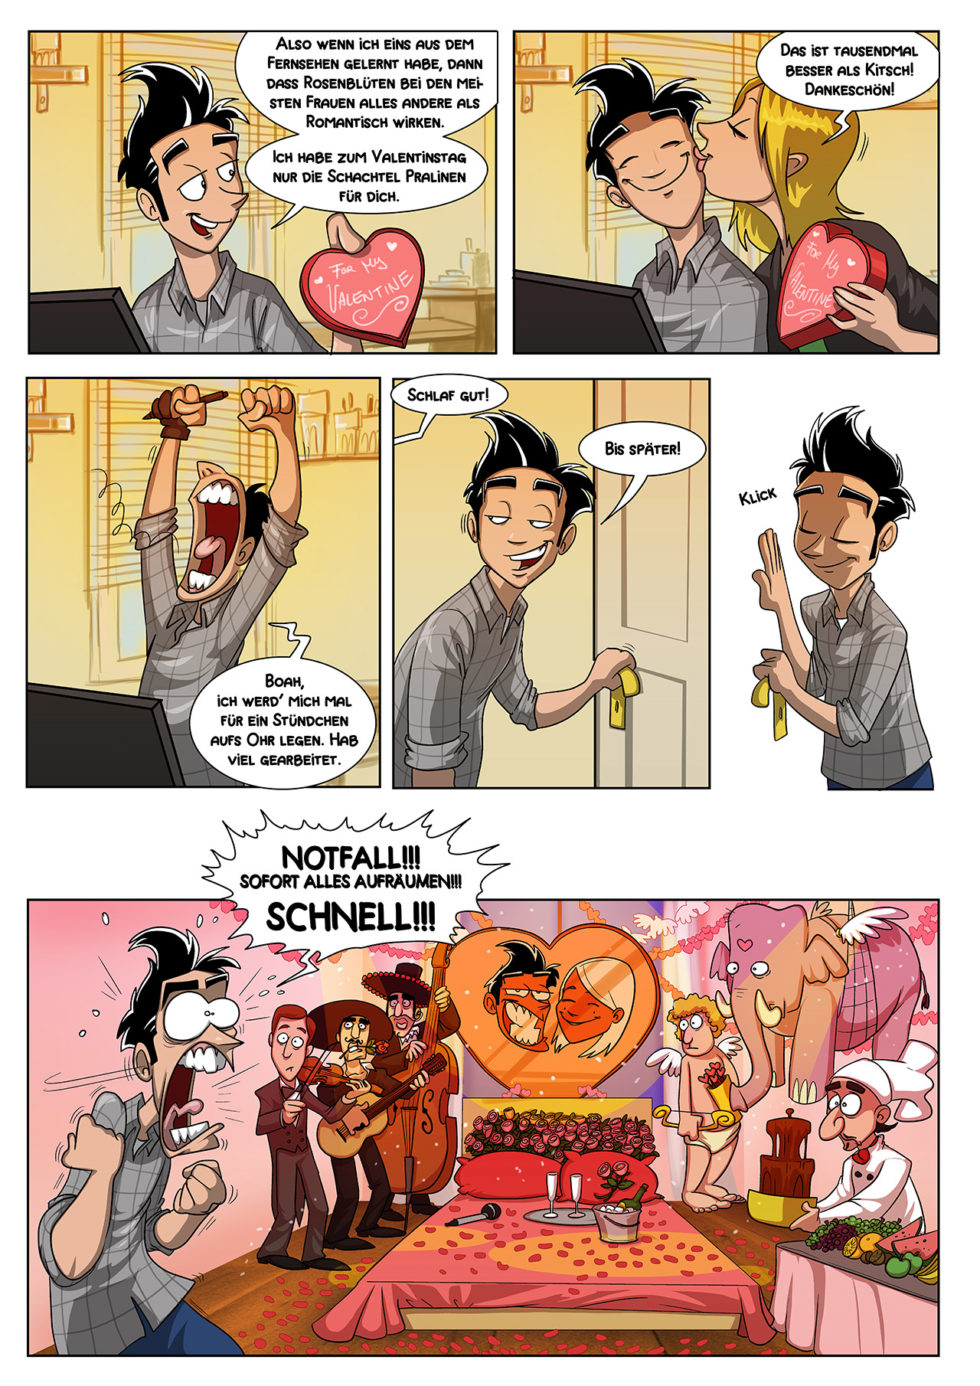 Valentinstag Schisslaweng Schisslaweng